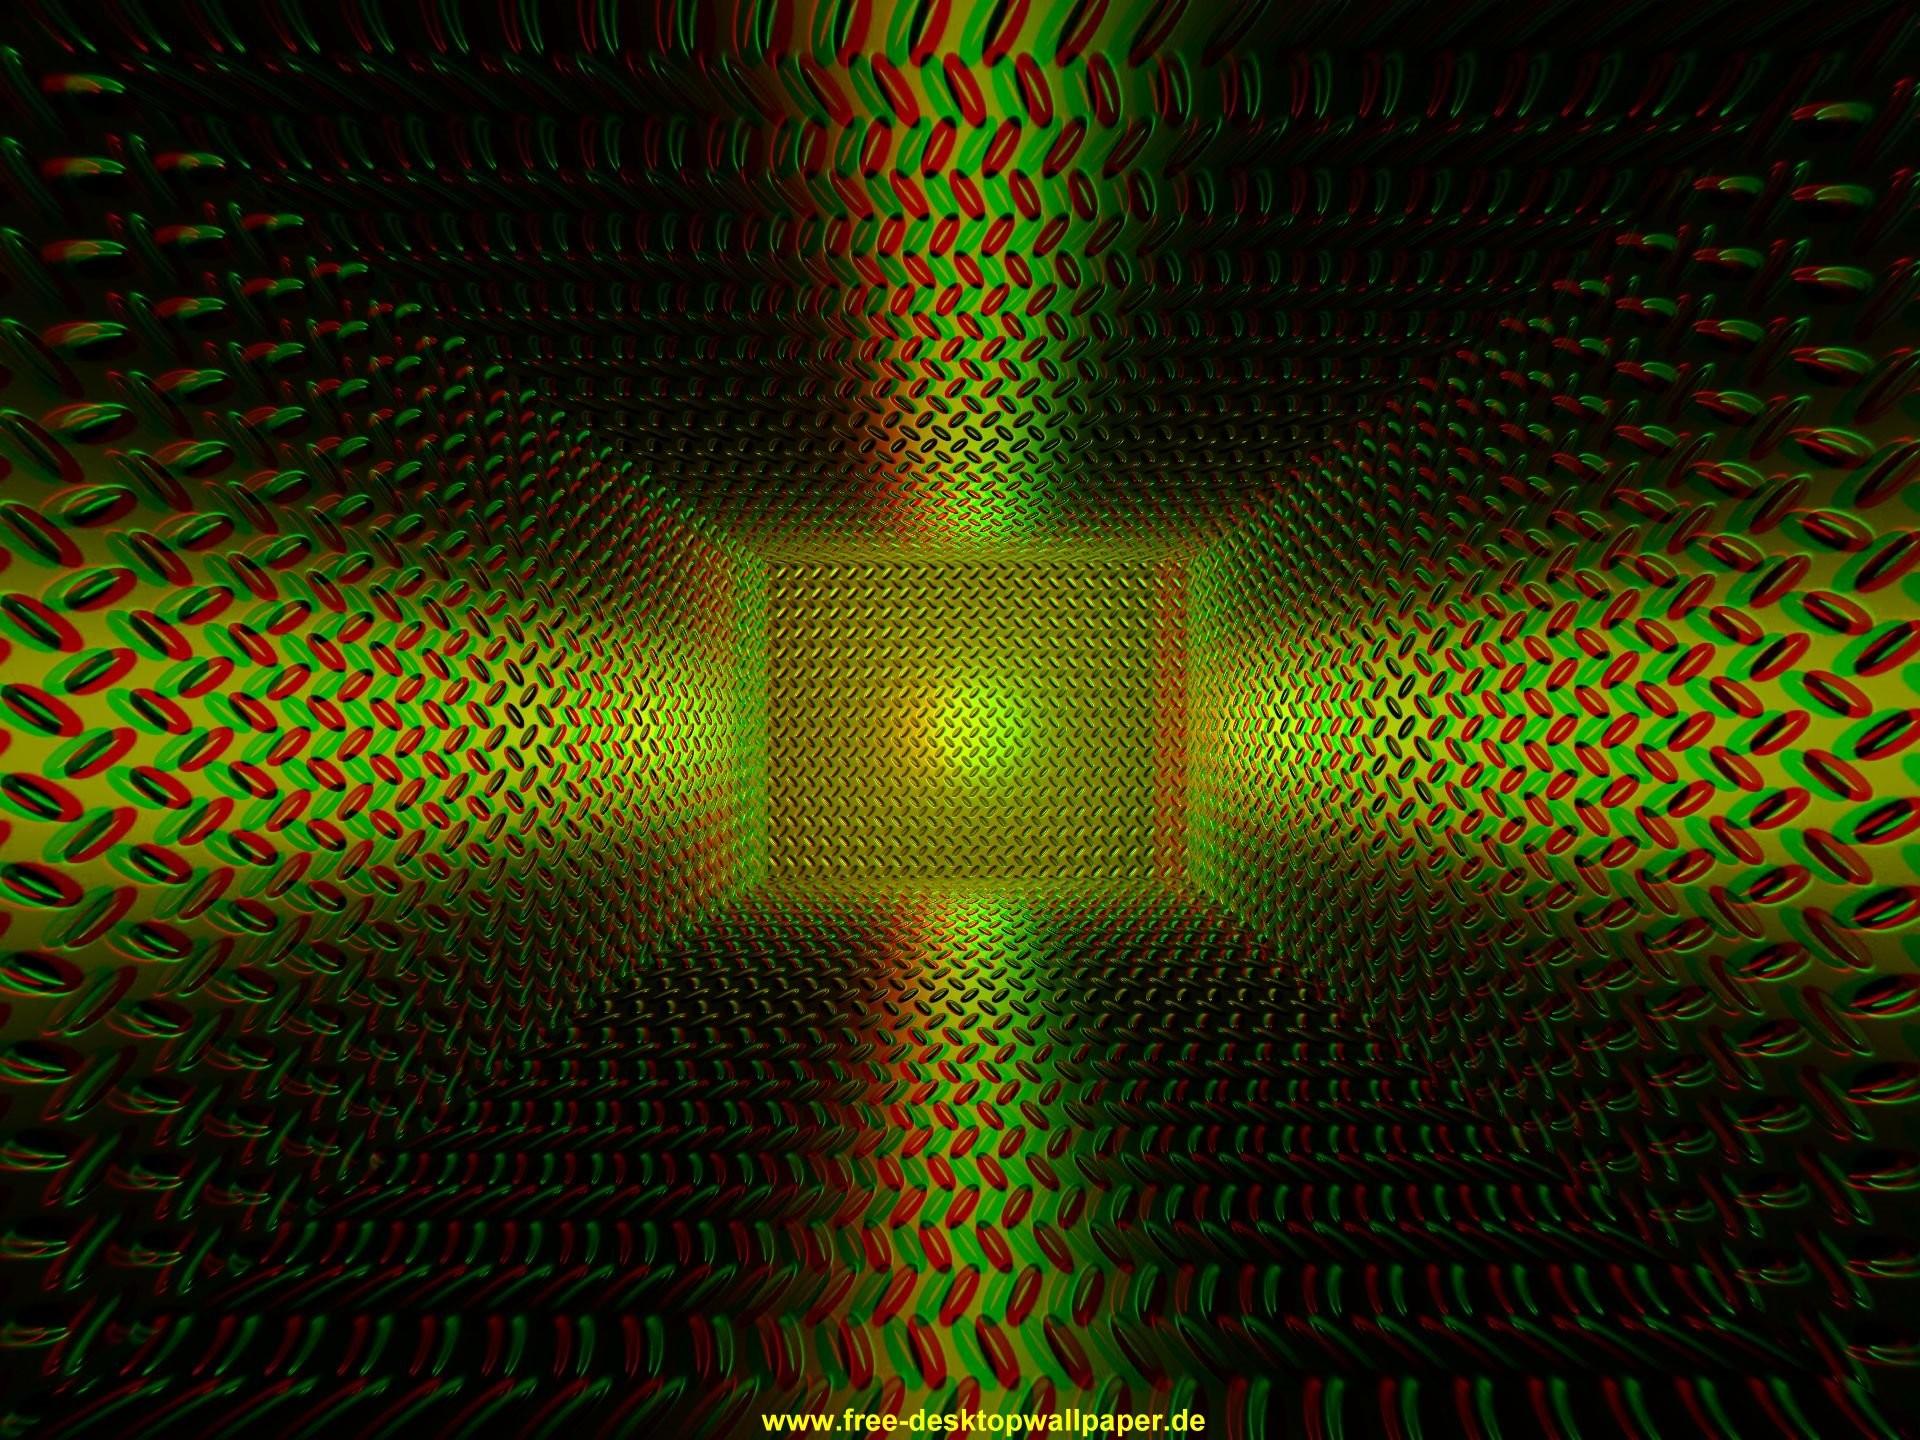 3D Wallpaper Hintergrundbild 3D Desktopbild